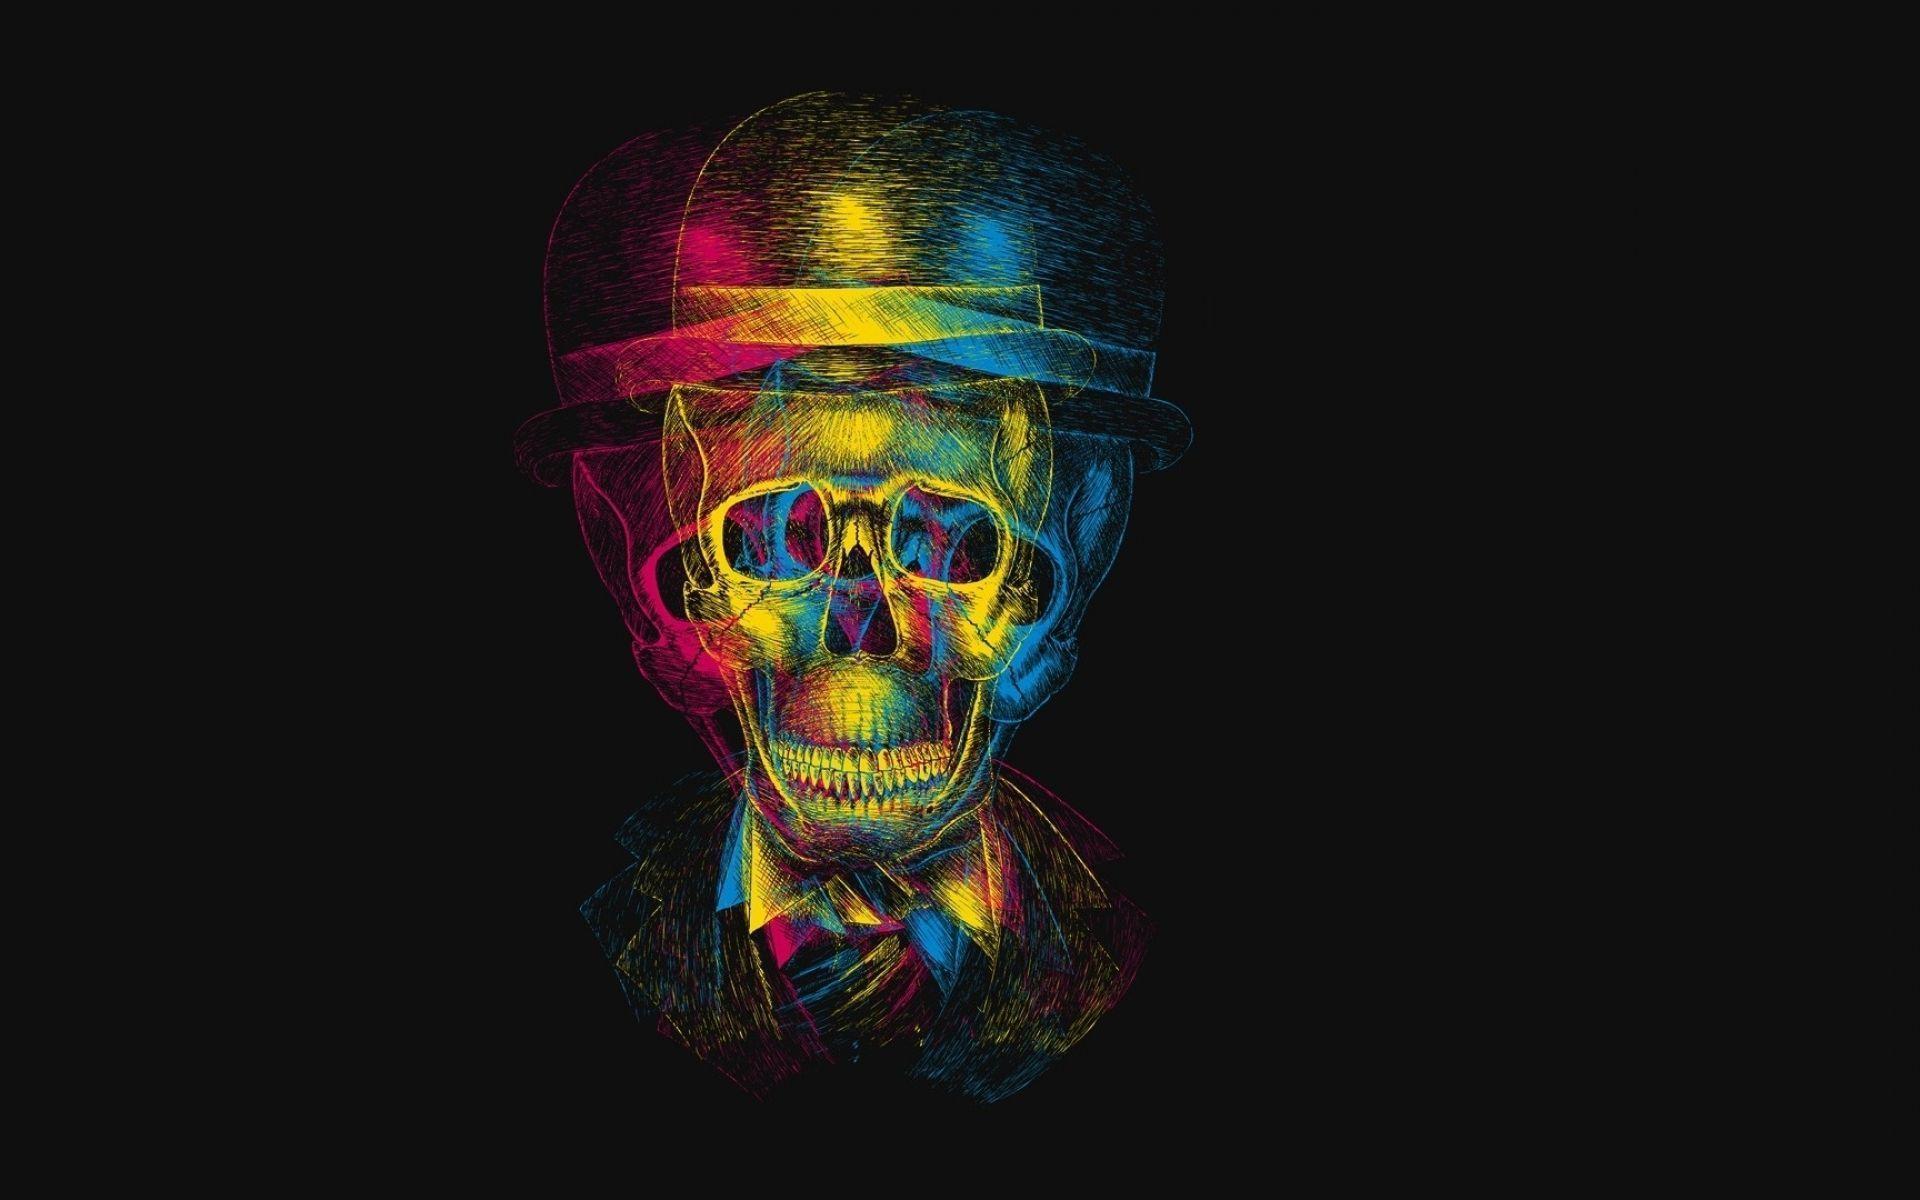 <b>Skull</b> Wallpapers, Top <b>Skull</b> HQ Pictures, <b>Skull</b> WD 144 Wallpapers